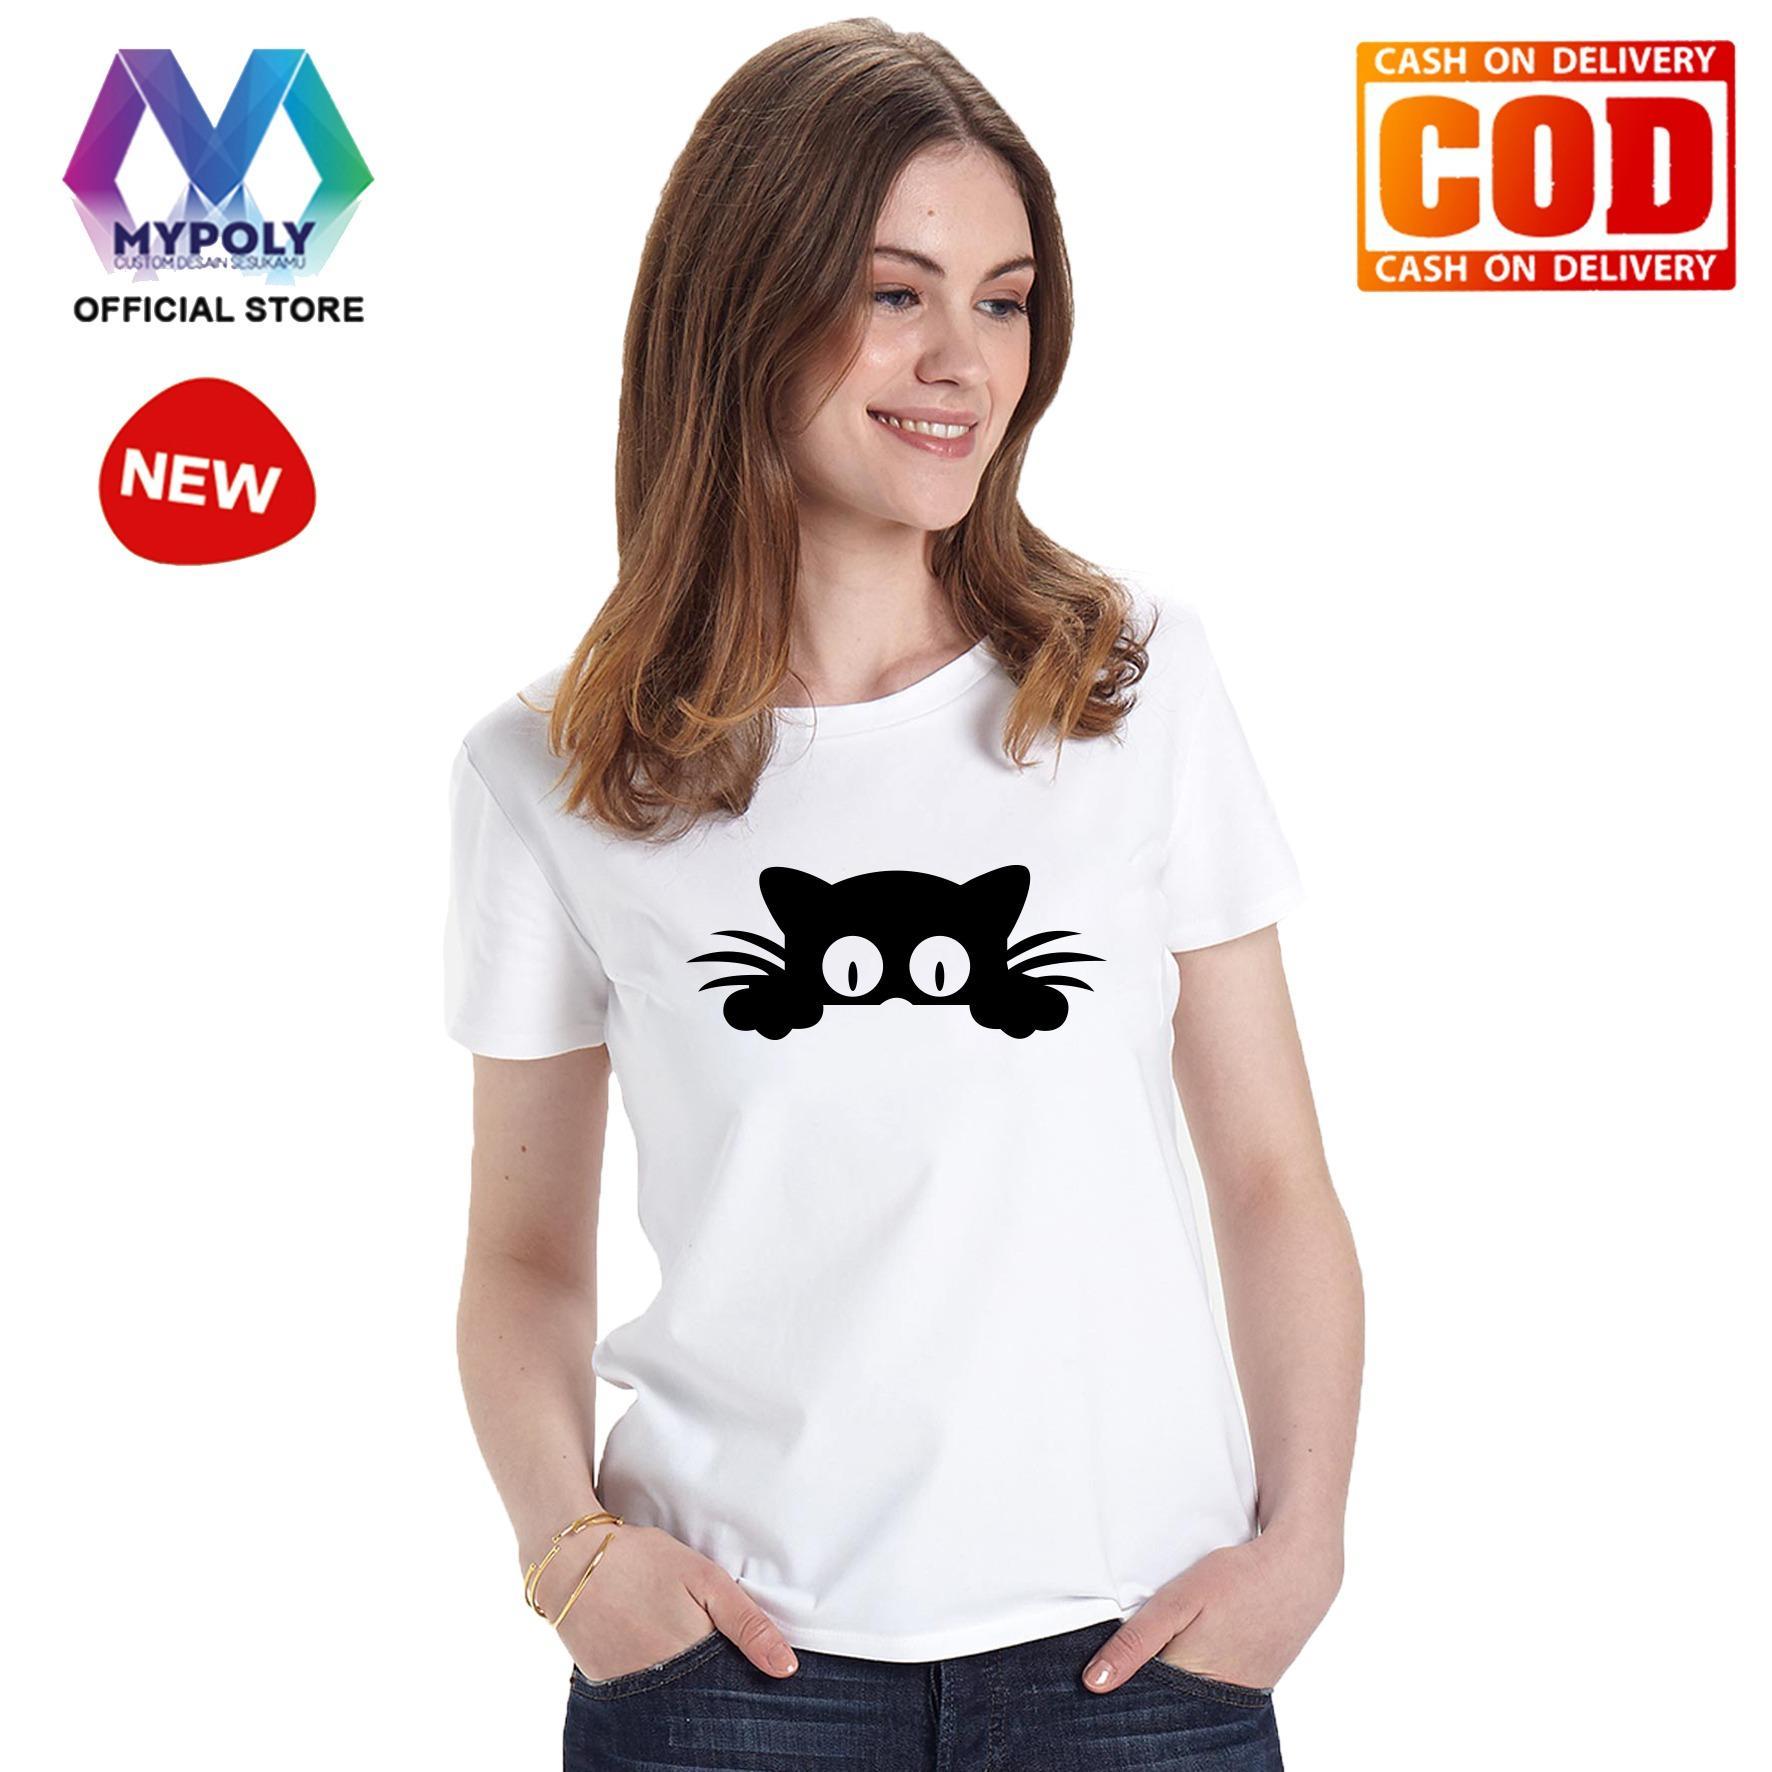 Kaos Premium Mypoly Wanita Perempuan WP / Baju Couple Family Keluarga / Tshirt distro Anak Wanita / Fashion atasan / Kaos Wanita Dewasa Cat Look Up